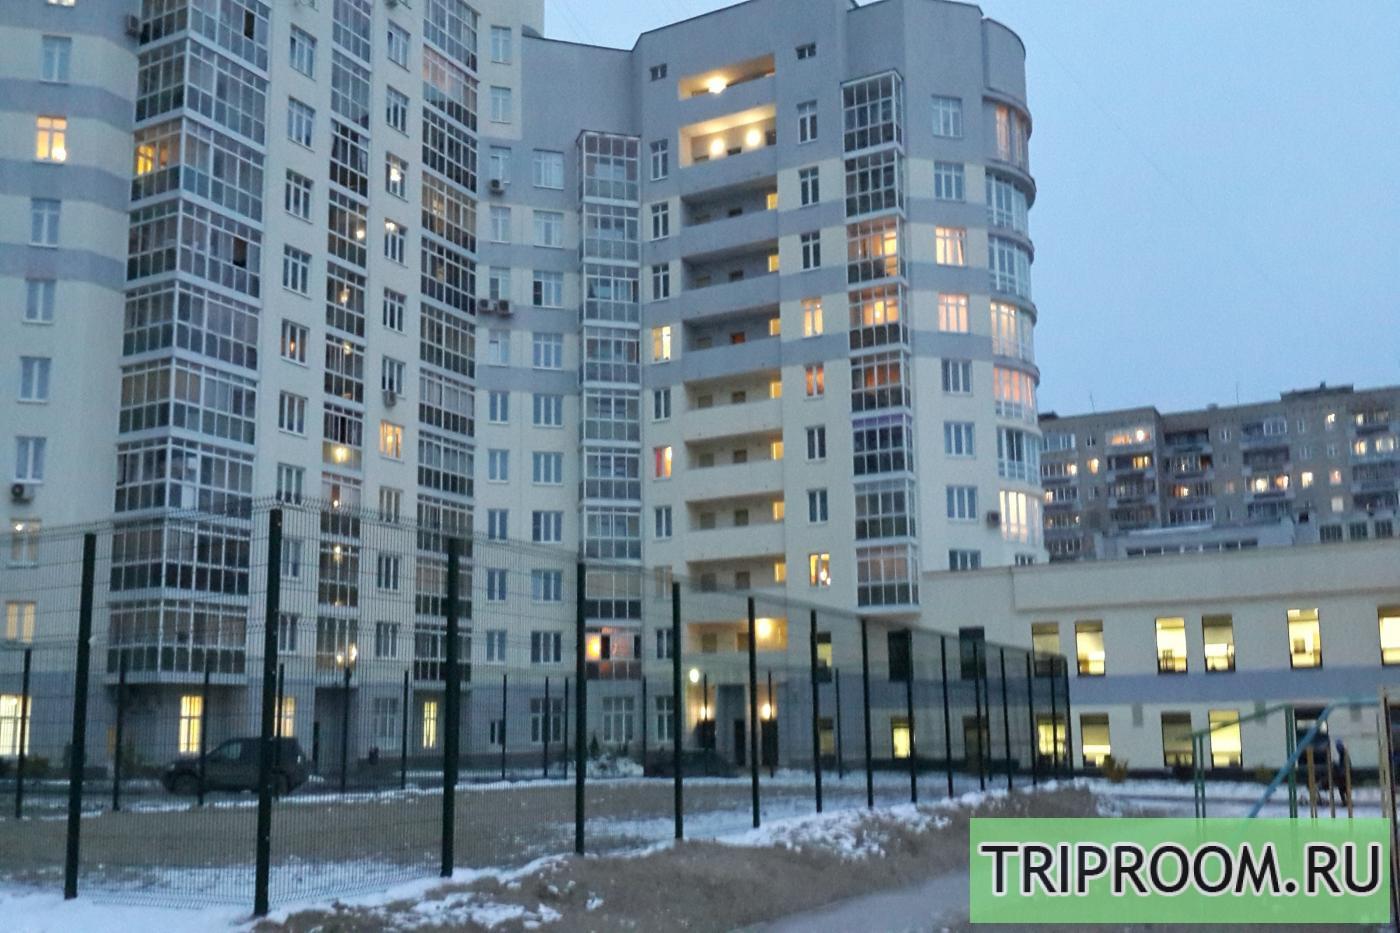 1-комнатная квартира посуточно (вариант № 13628), ул. Чкалова улица, фото № 2